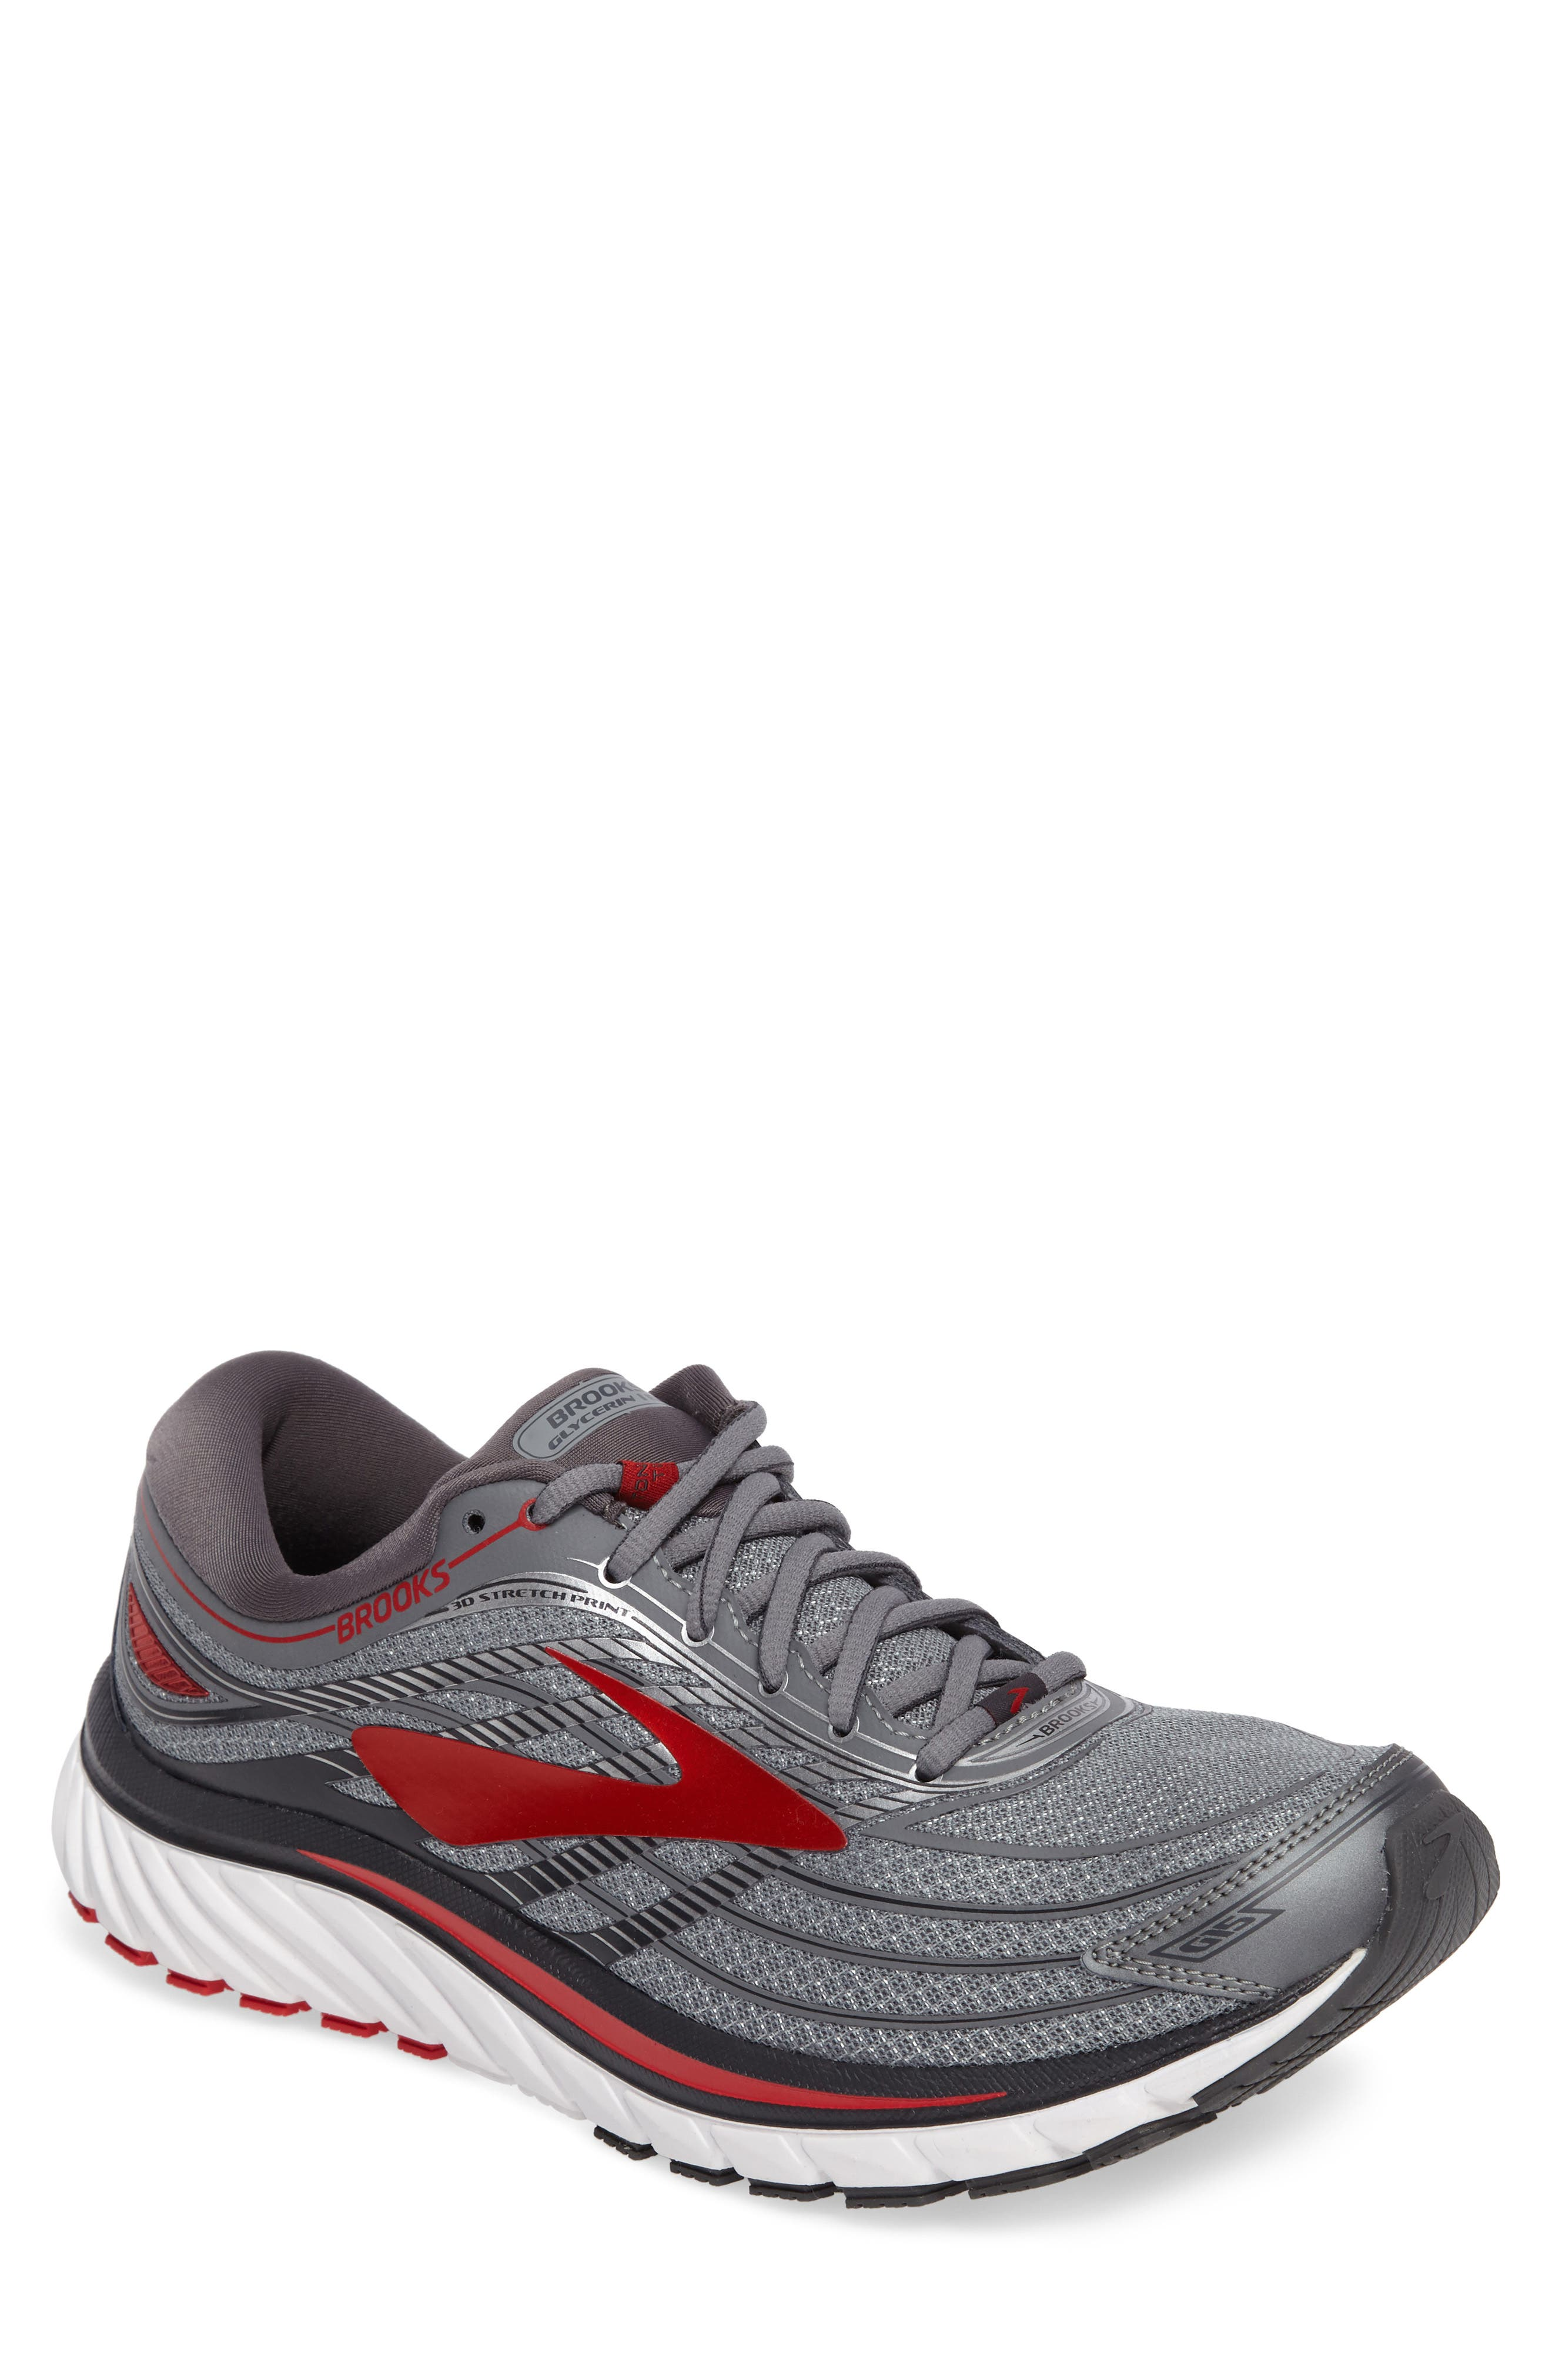 Alternate Image 1 Selected - Brooks Glycerin 15 Running Shoe (Men)